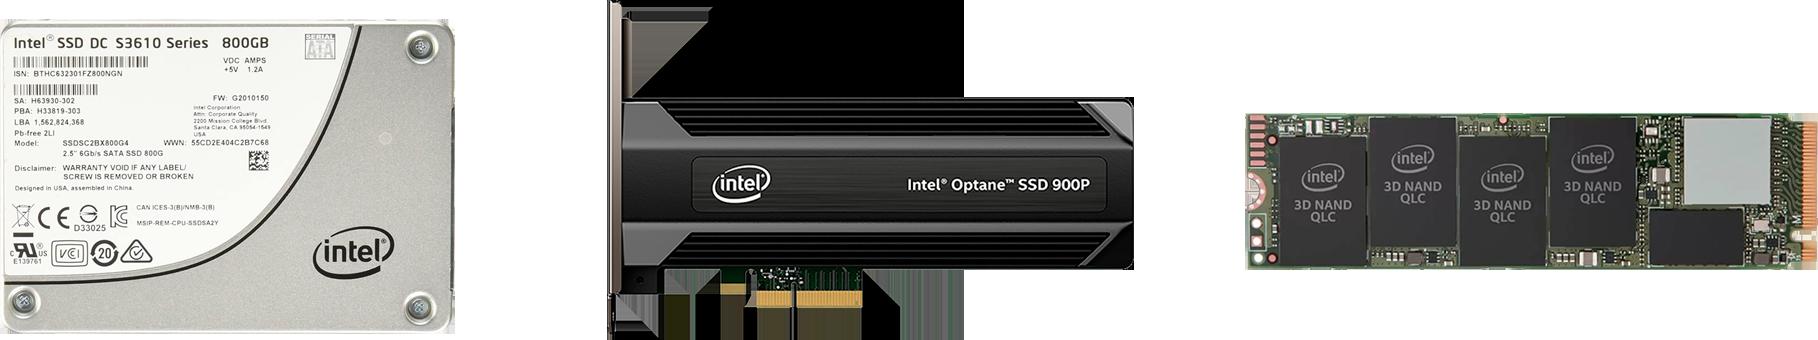 Intel Data Recovery